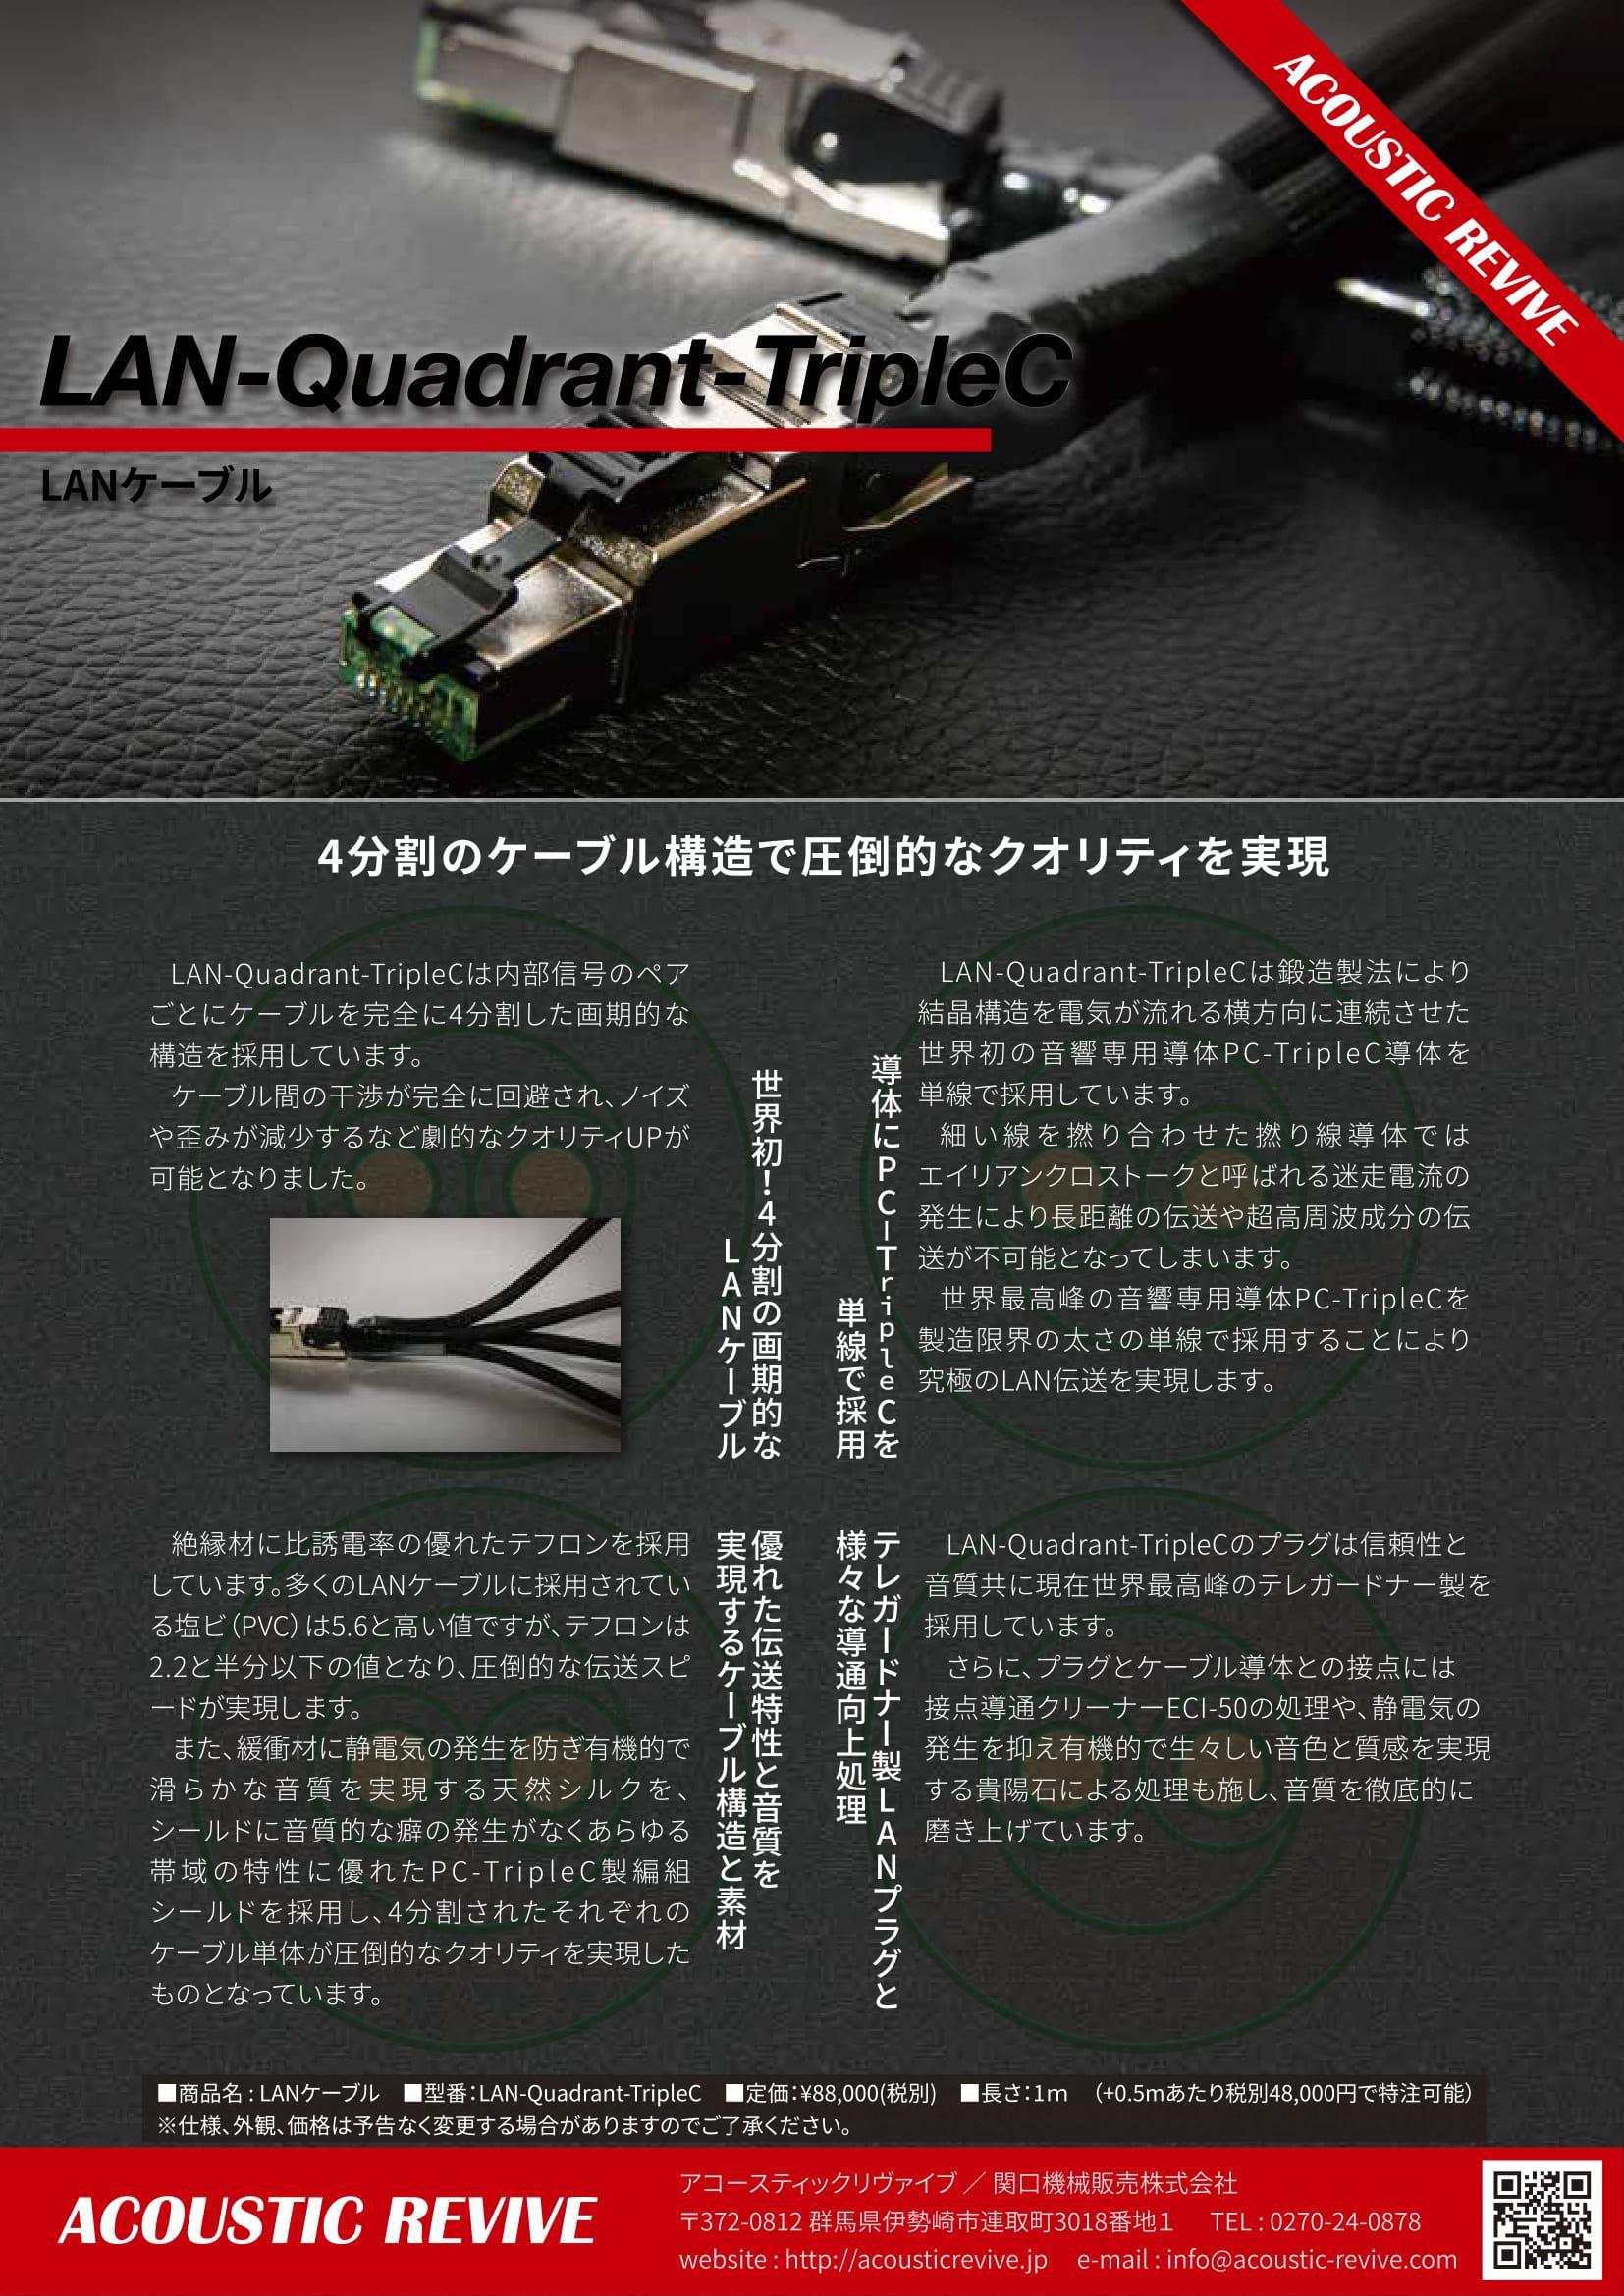 LAN-Quadrant-TripleC販促資料-1